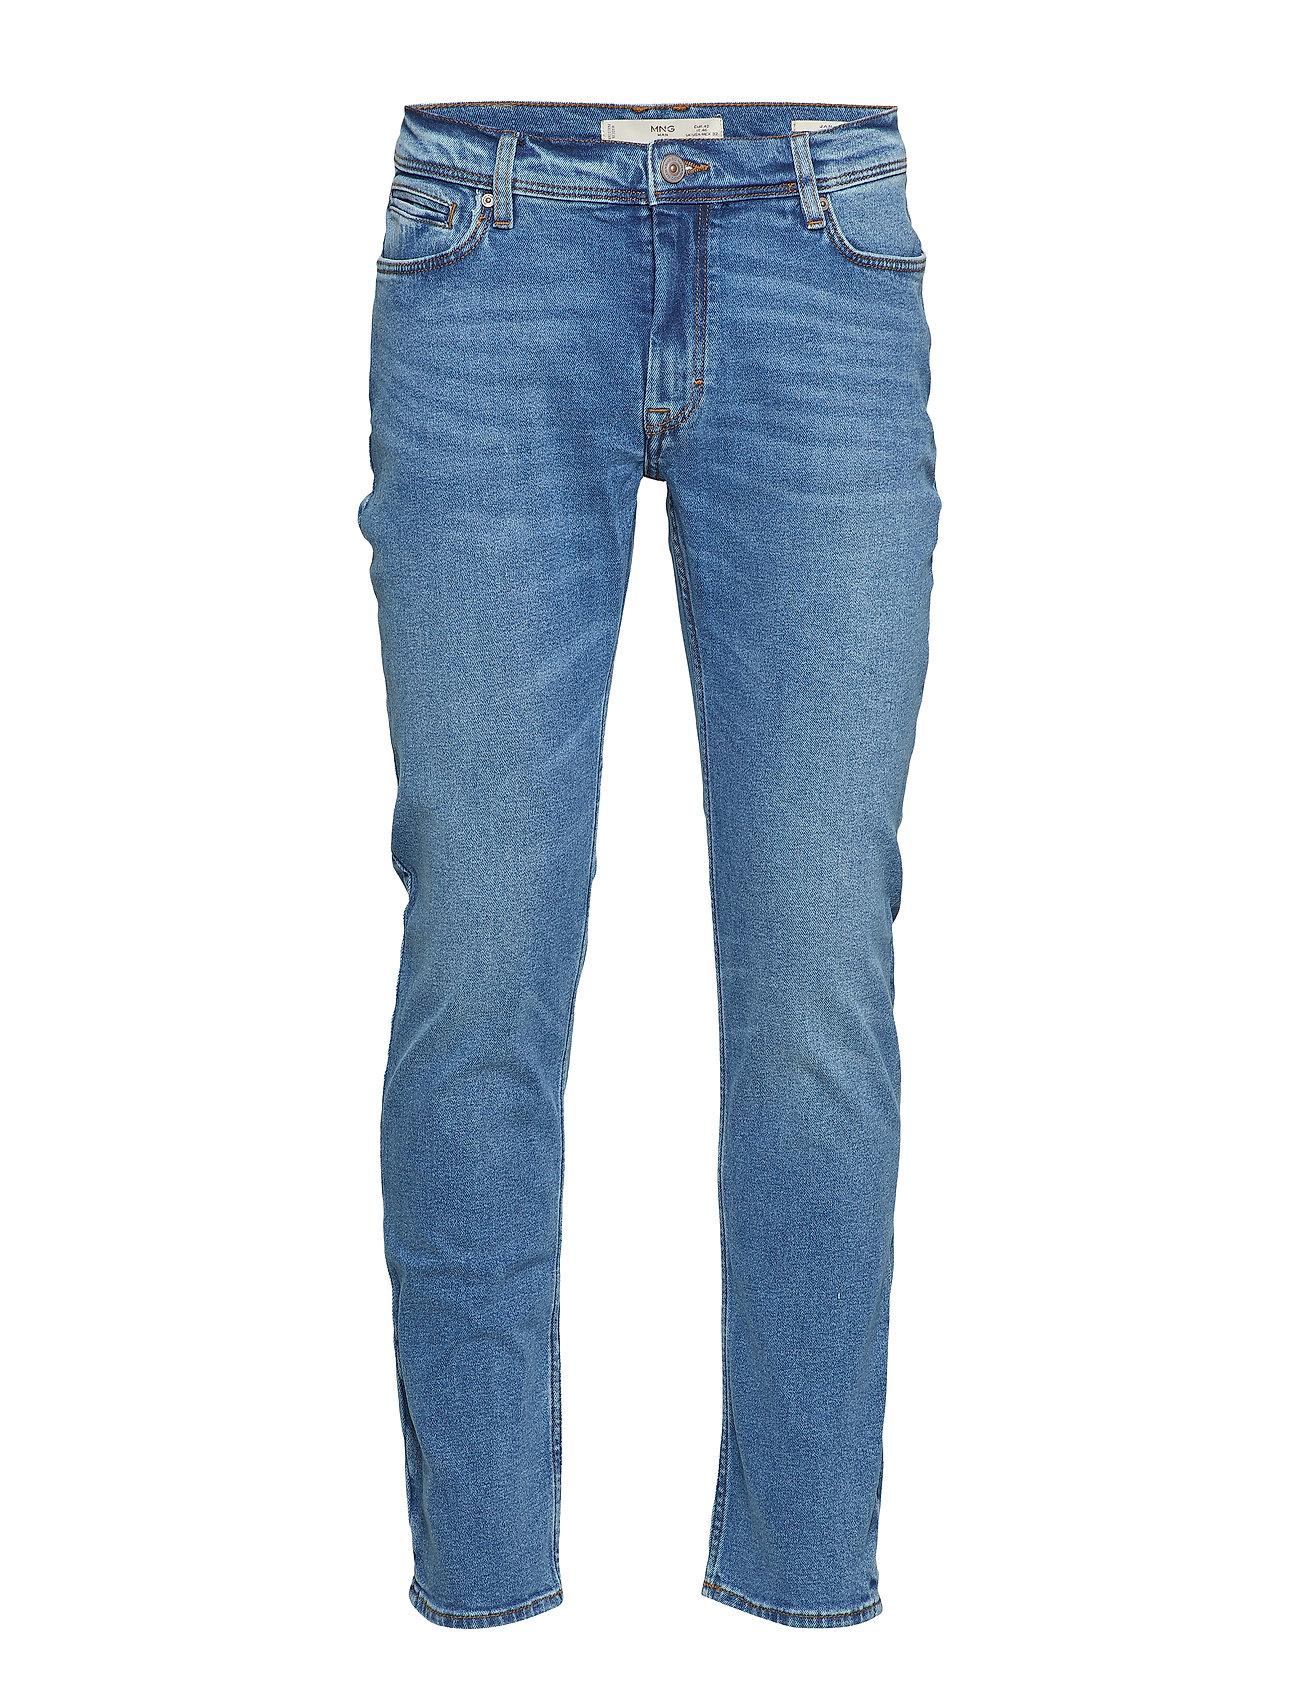 Mango Man Slim fit light wash Jan jeans Jeans